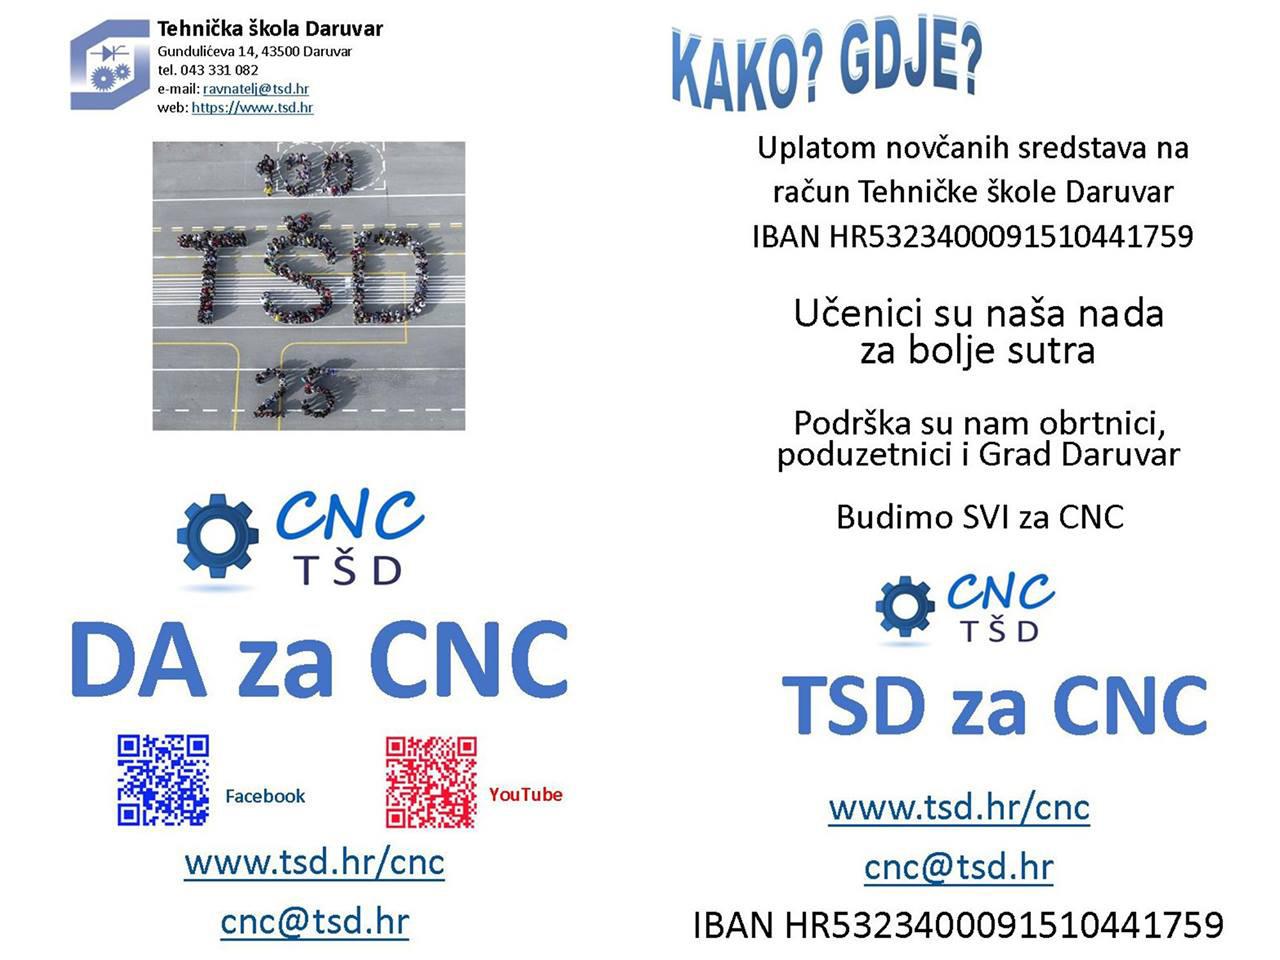 DA za CNC